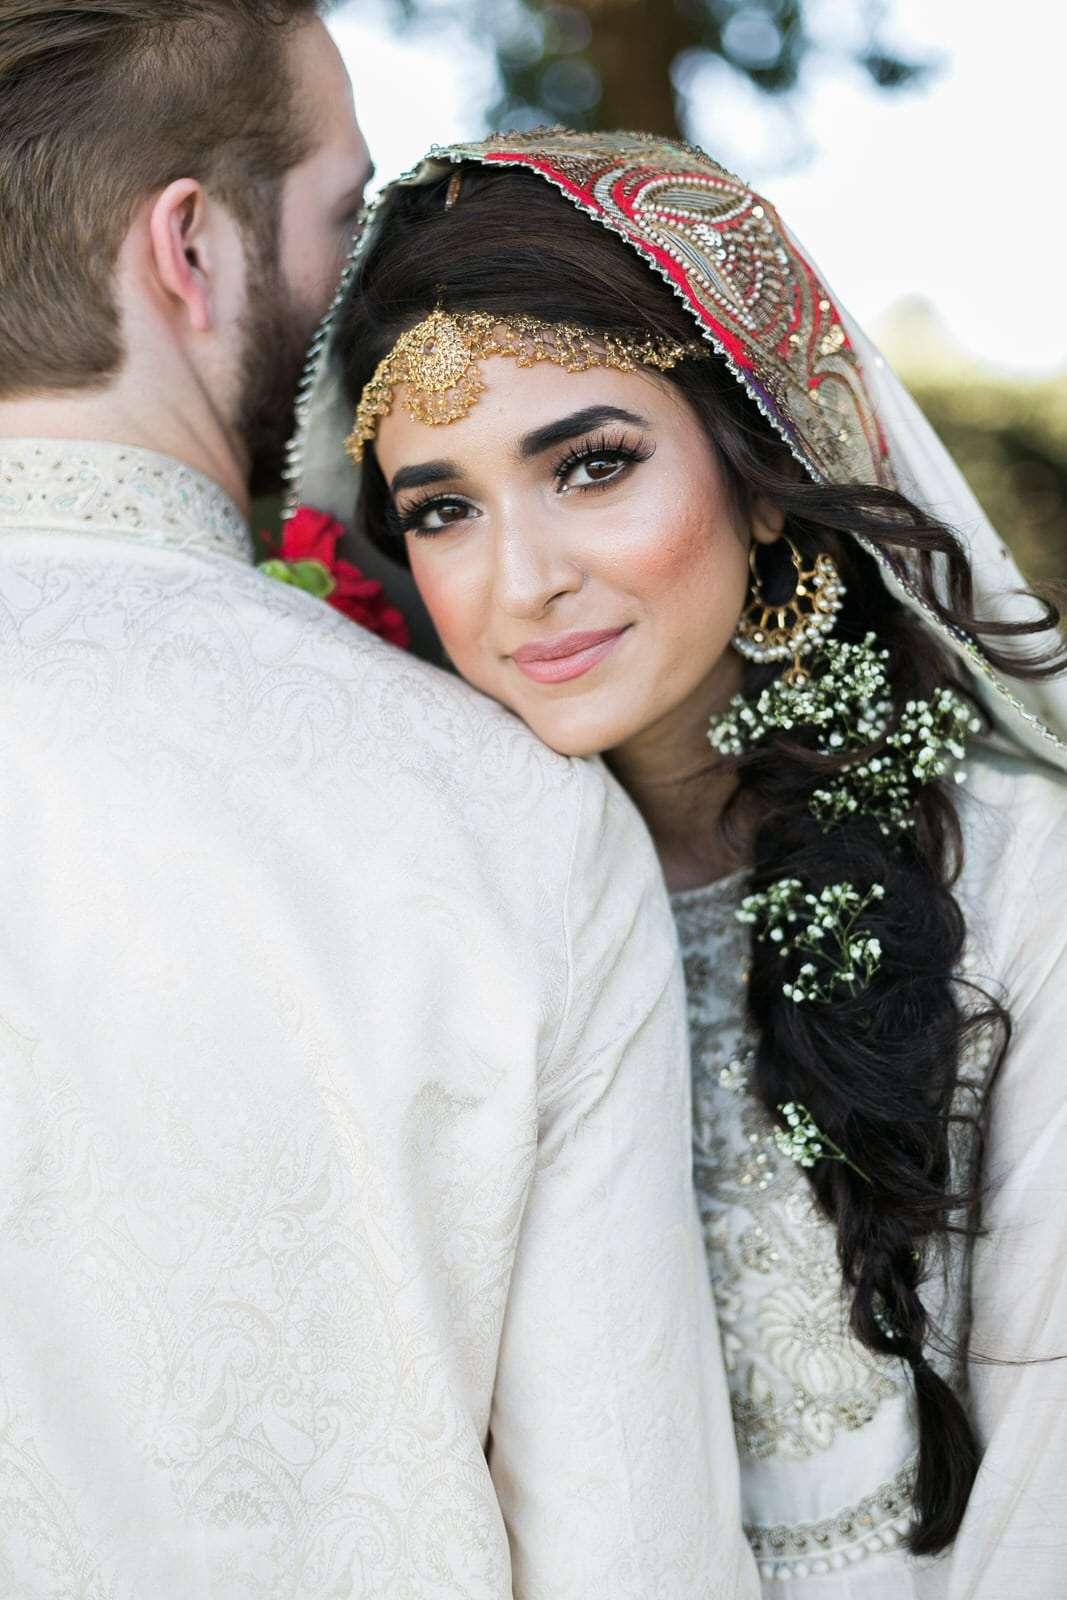 muslim wedding bride with henna